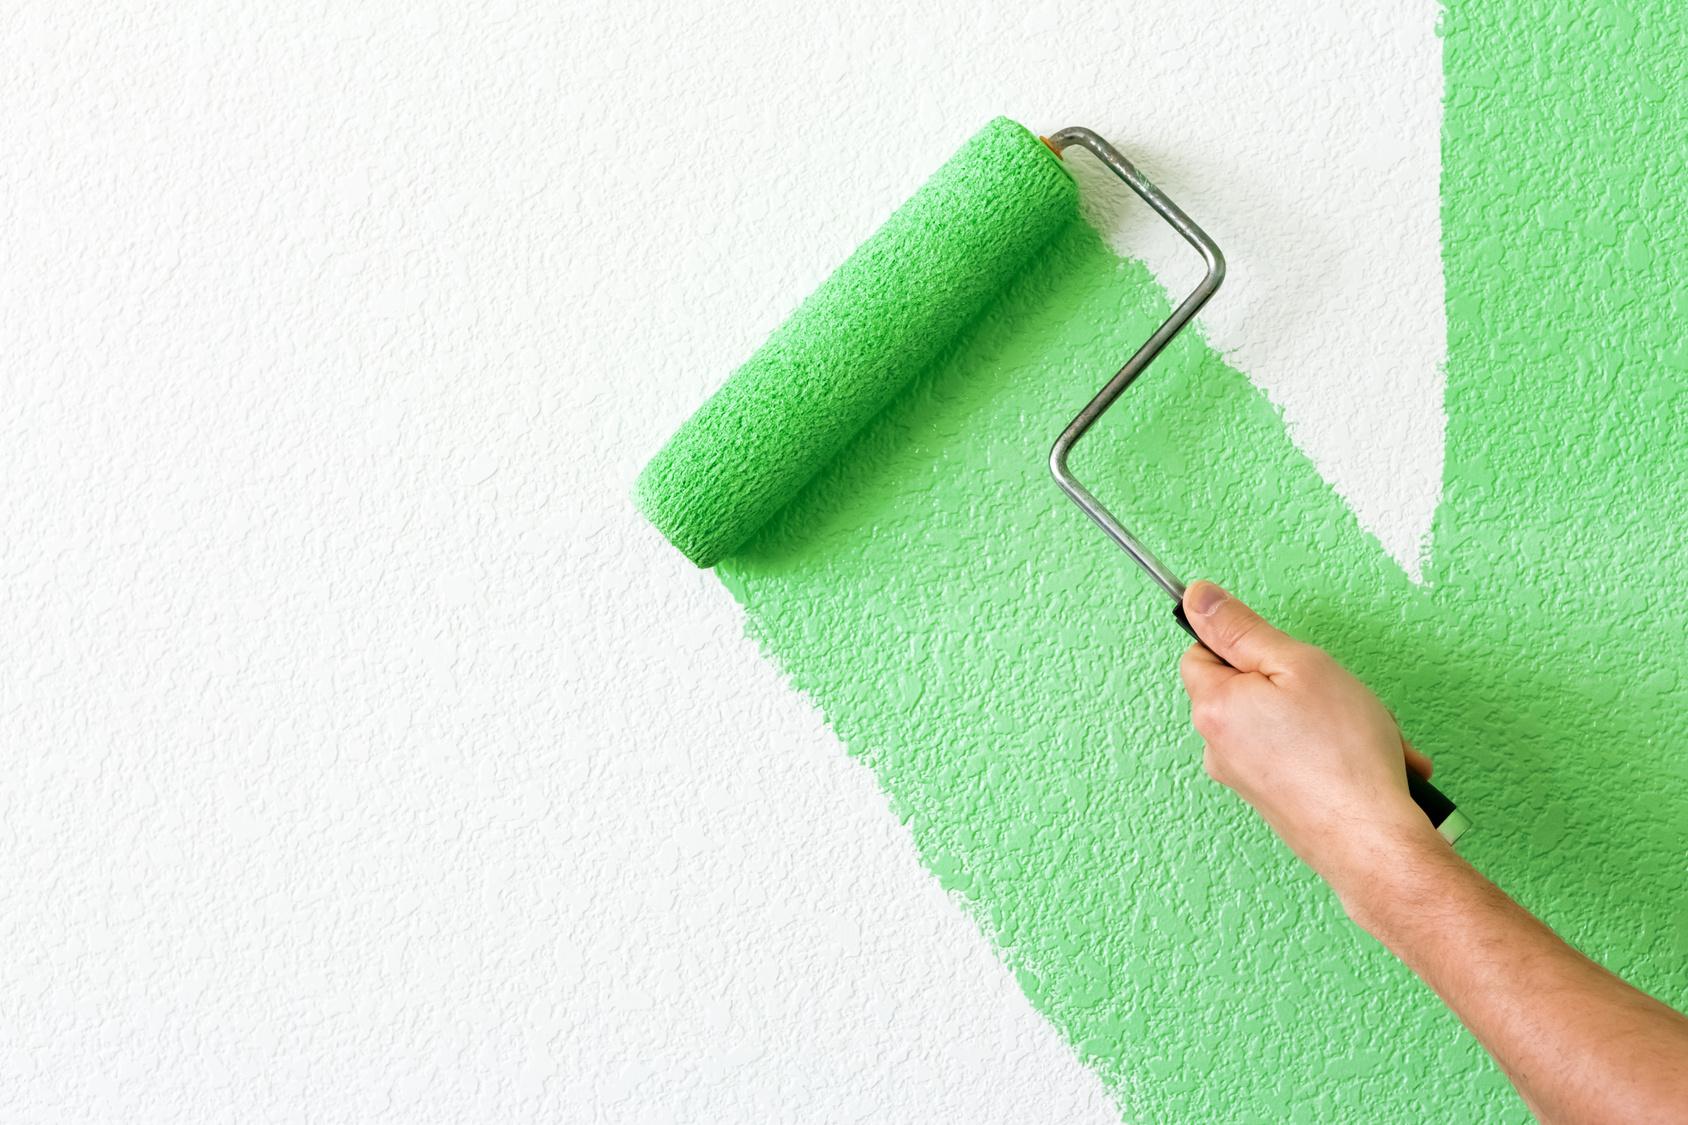 Mur Humide Peinture Cool Preparer Un Mur Avant Peinture Daccoration